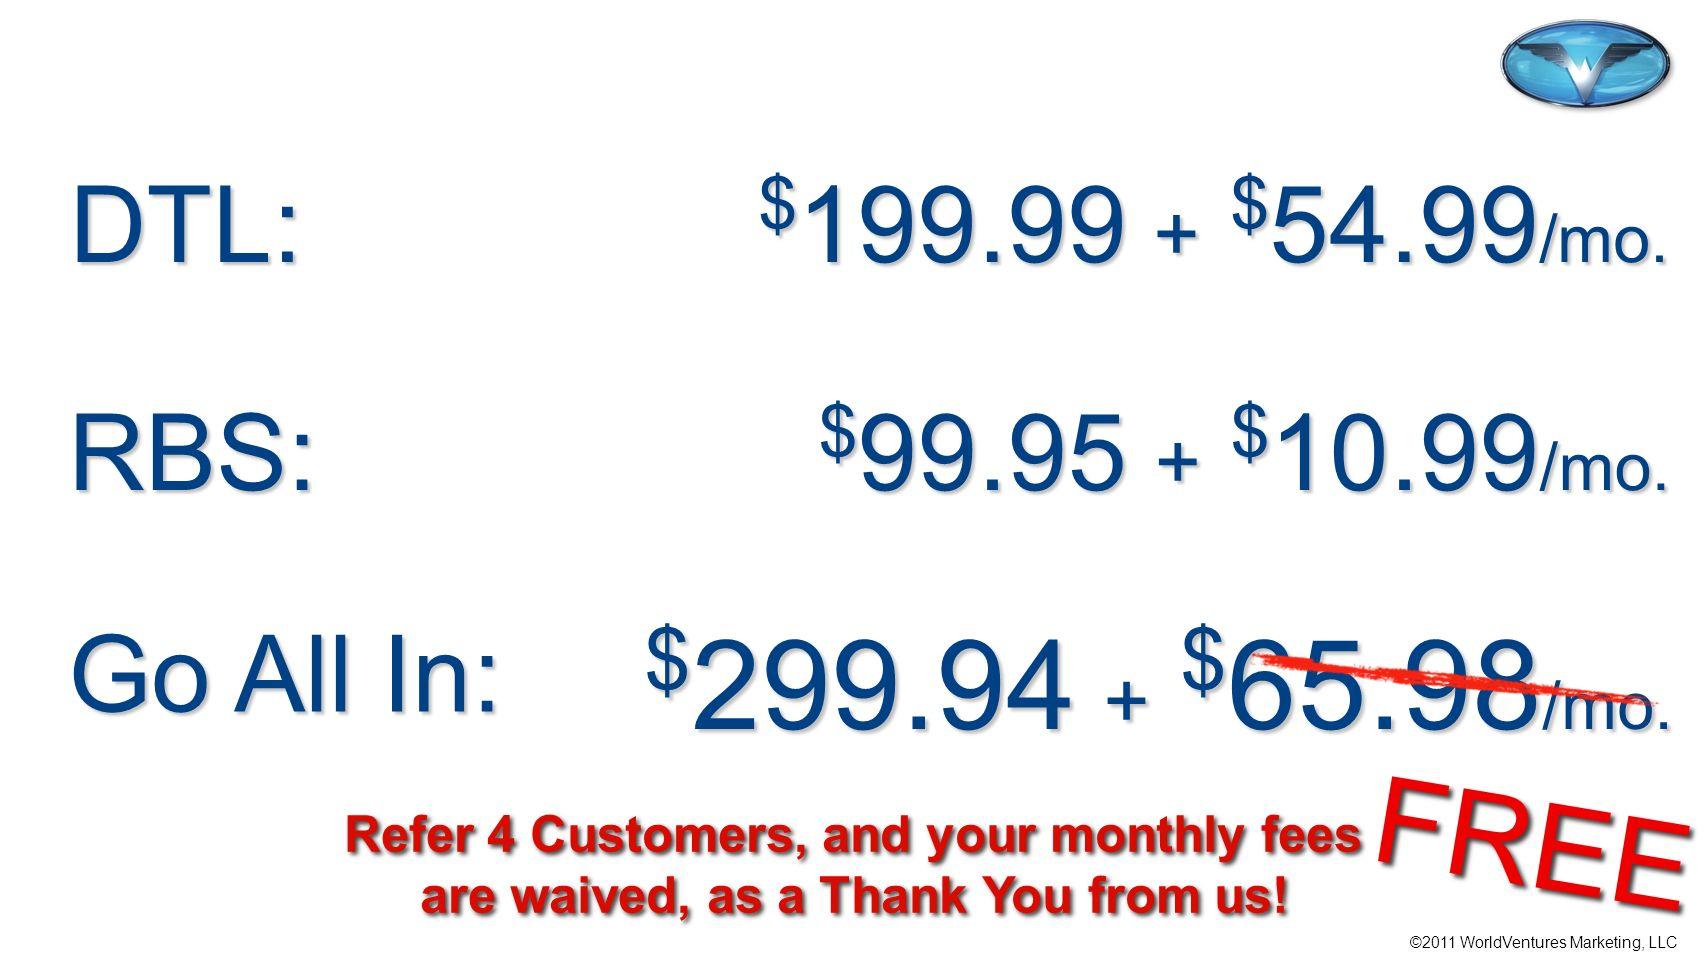 $299.94 + $65.98/mo. FREE DTL: $199.99 + $54.99/mo. RBS: